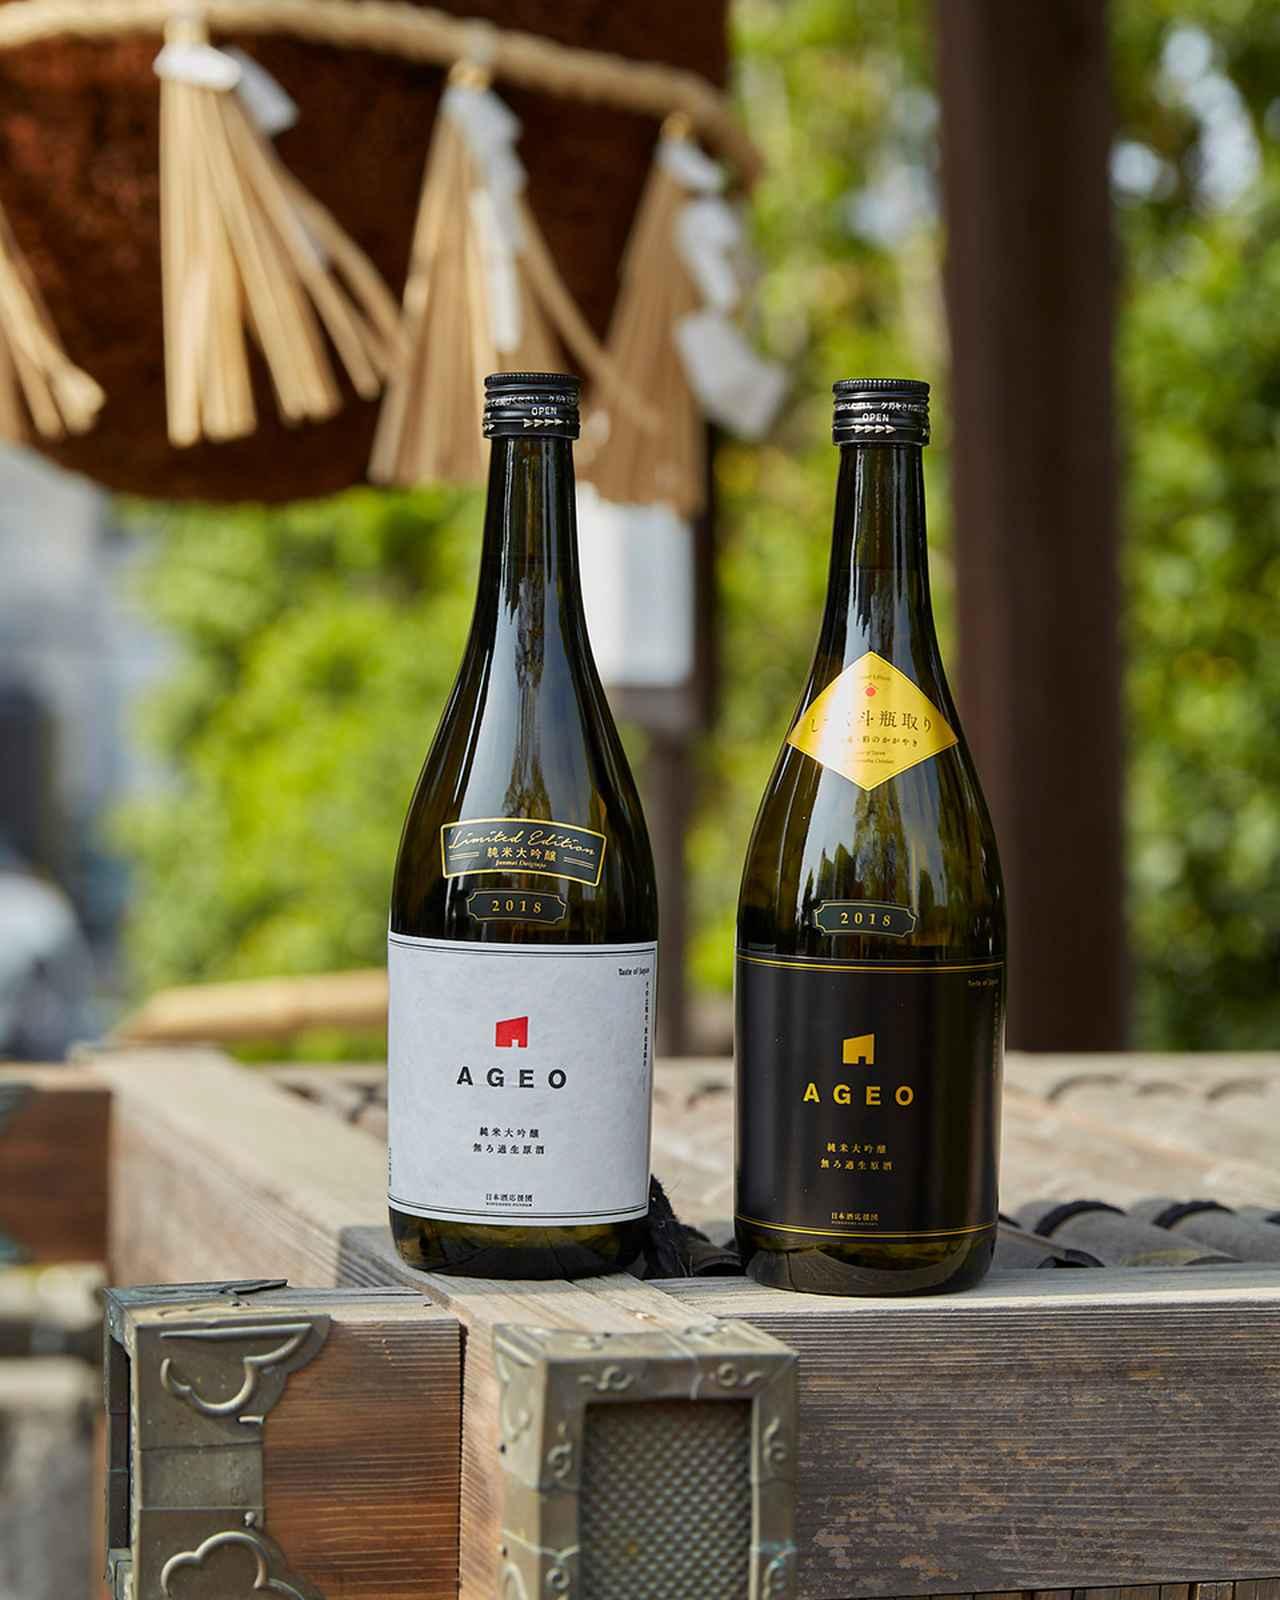 Images : 7番目の画像 - 「日本酒応援団を支える 酒蔵を訪ねて Vol.2 ~ 埼玉県上尾市「北西酒造」~」のアルバム - T JAPAN:The New York Times Style Magazine 公式サイト